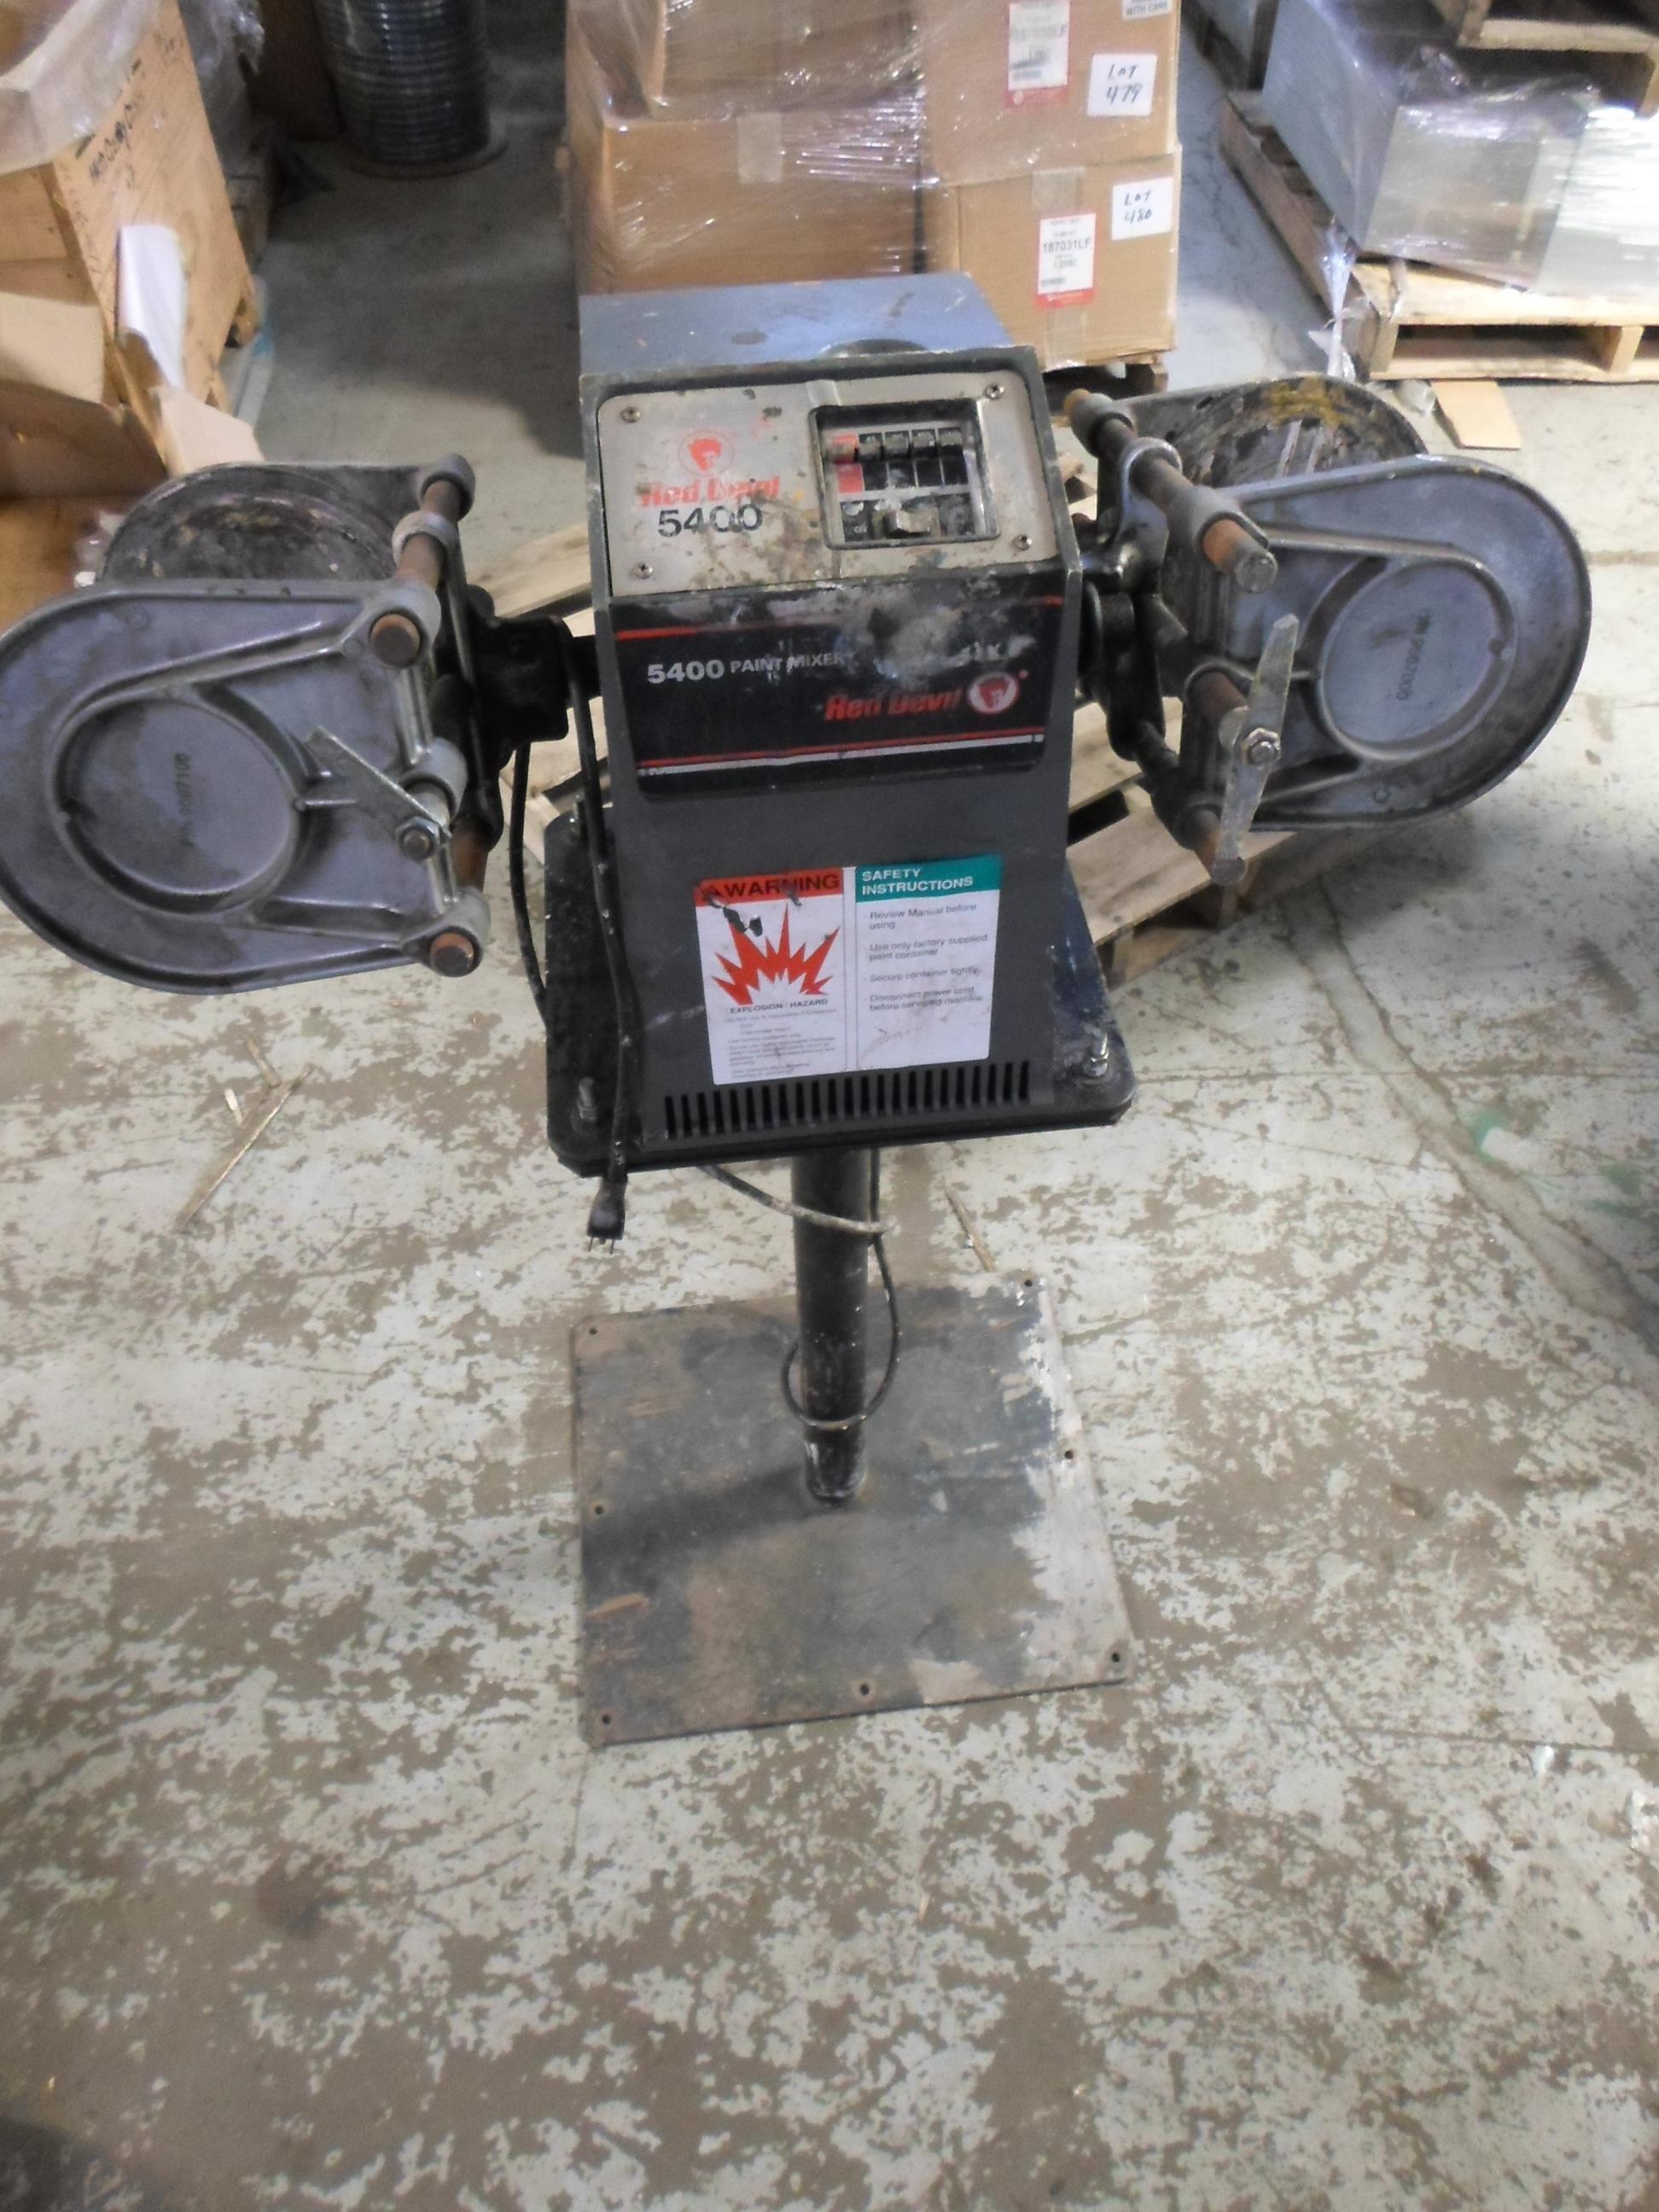 Red Devil 5400 Wiring Diagram Free Download John Deere Dual Arm 2 Gallon Paint Shaker Mixer Pedastal Parts